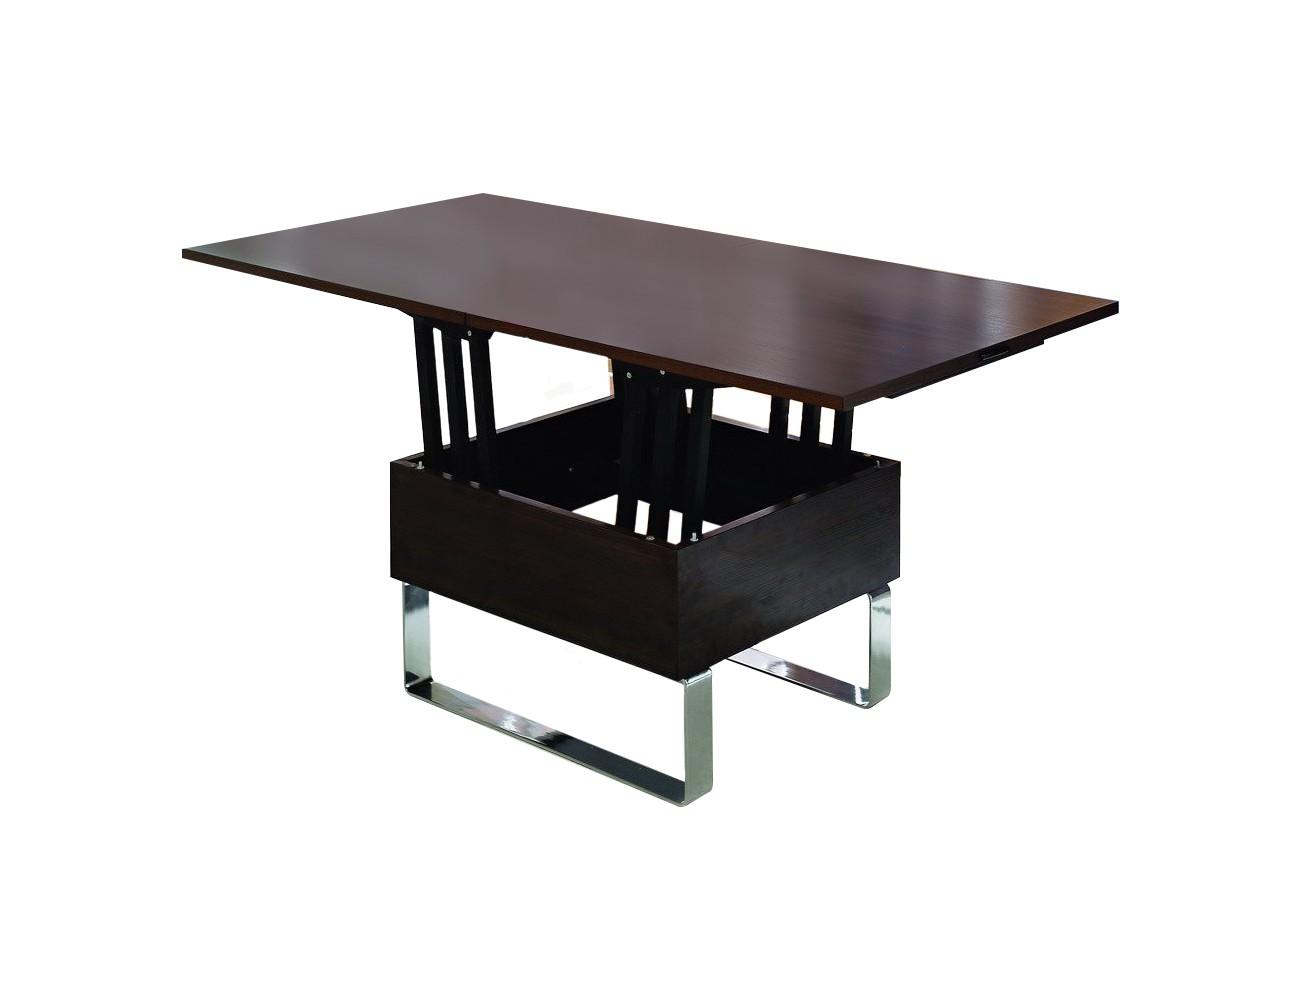 Europe Style Стол В2218 AG венге europe style стол dt 903 белый